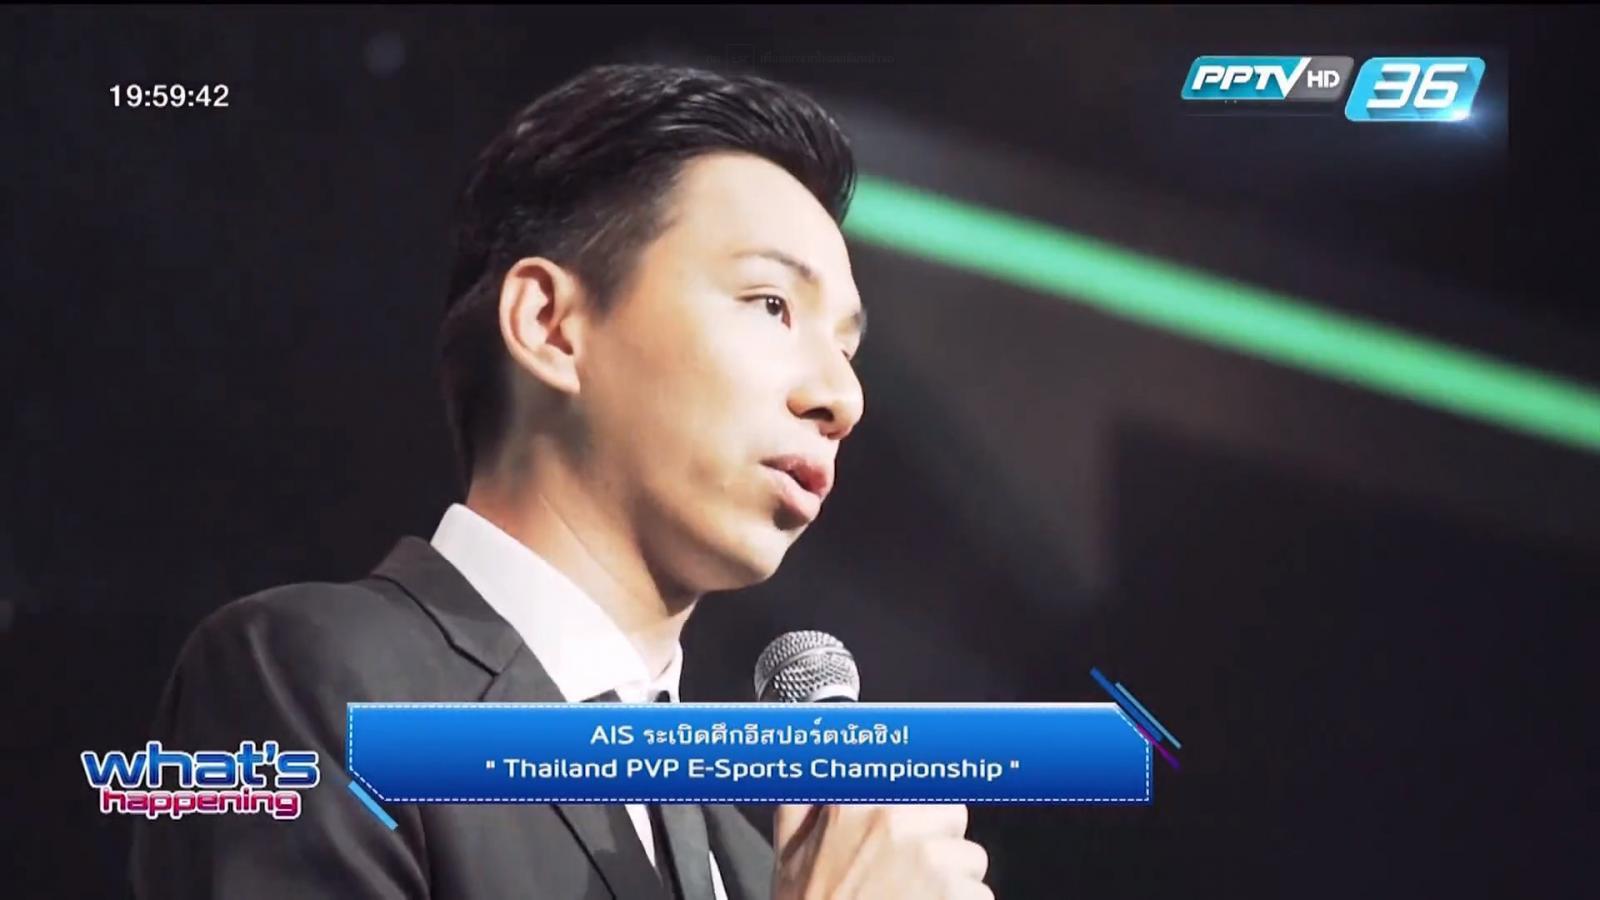 "AIS ระเบิดศึกอีสปอร์ตนัดชิง! ""Thailand PVP E-Sports Championship"""